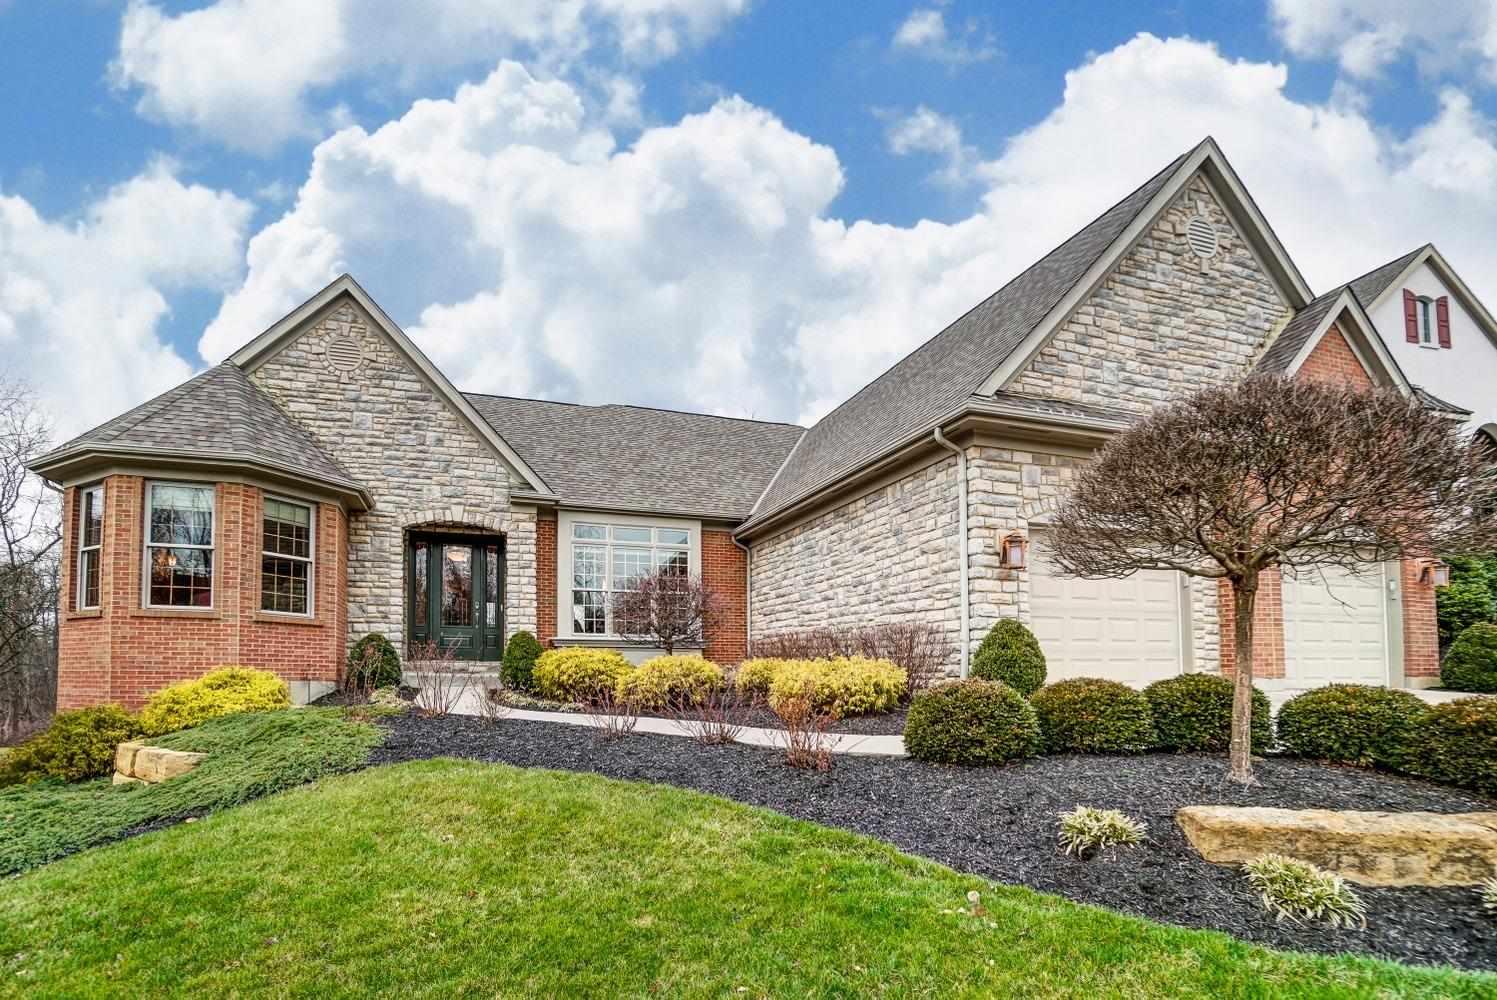 Property for sale at 4507 Ravenwood Court, Union Twp,  Ohio 45244